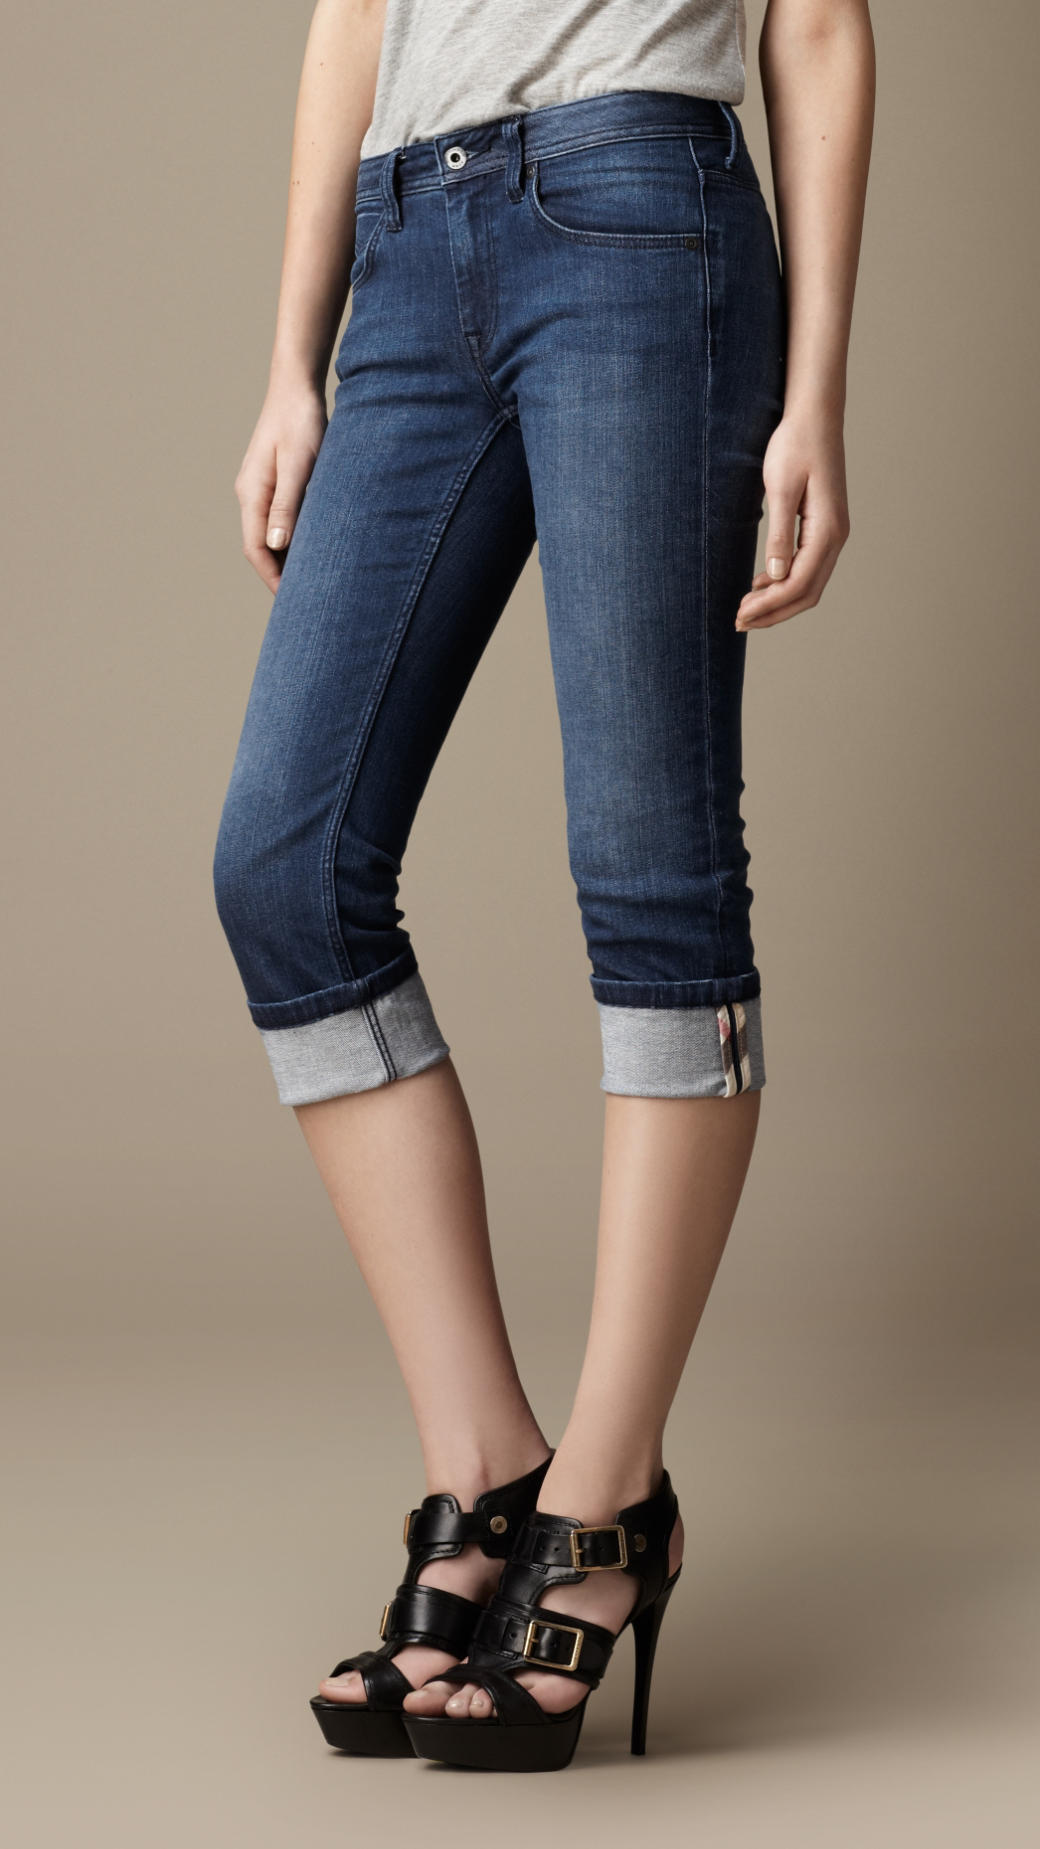 skinny fit capri jeans with heels